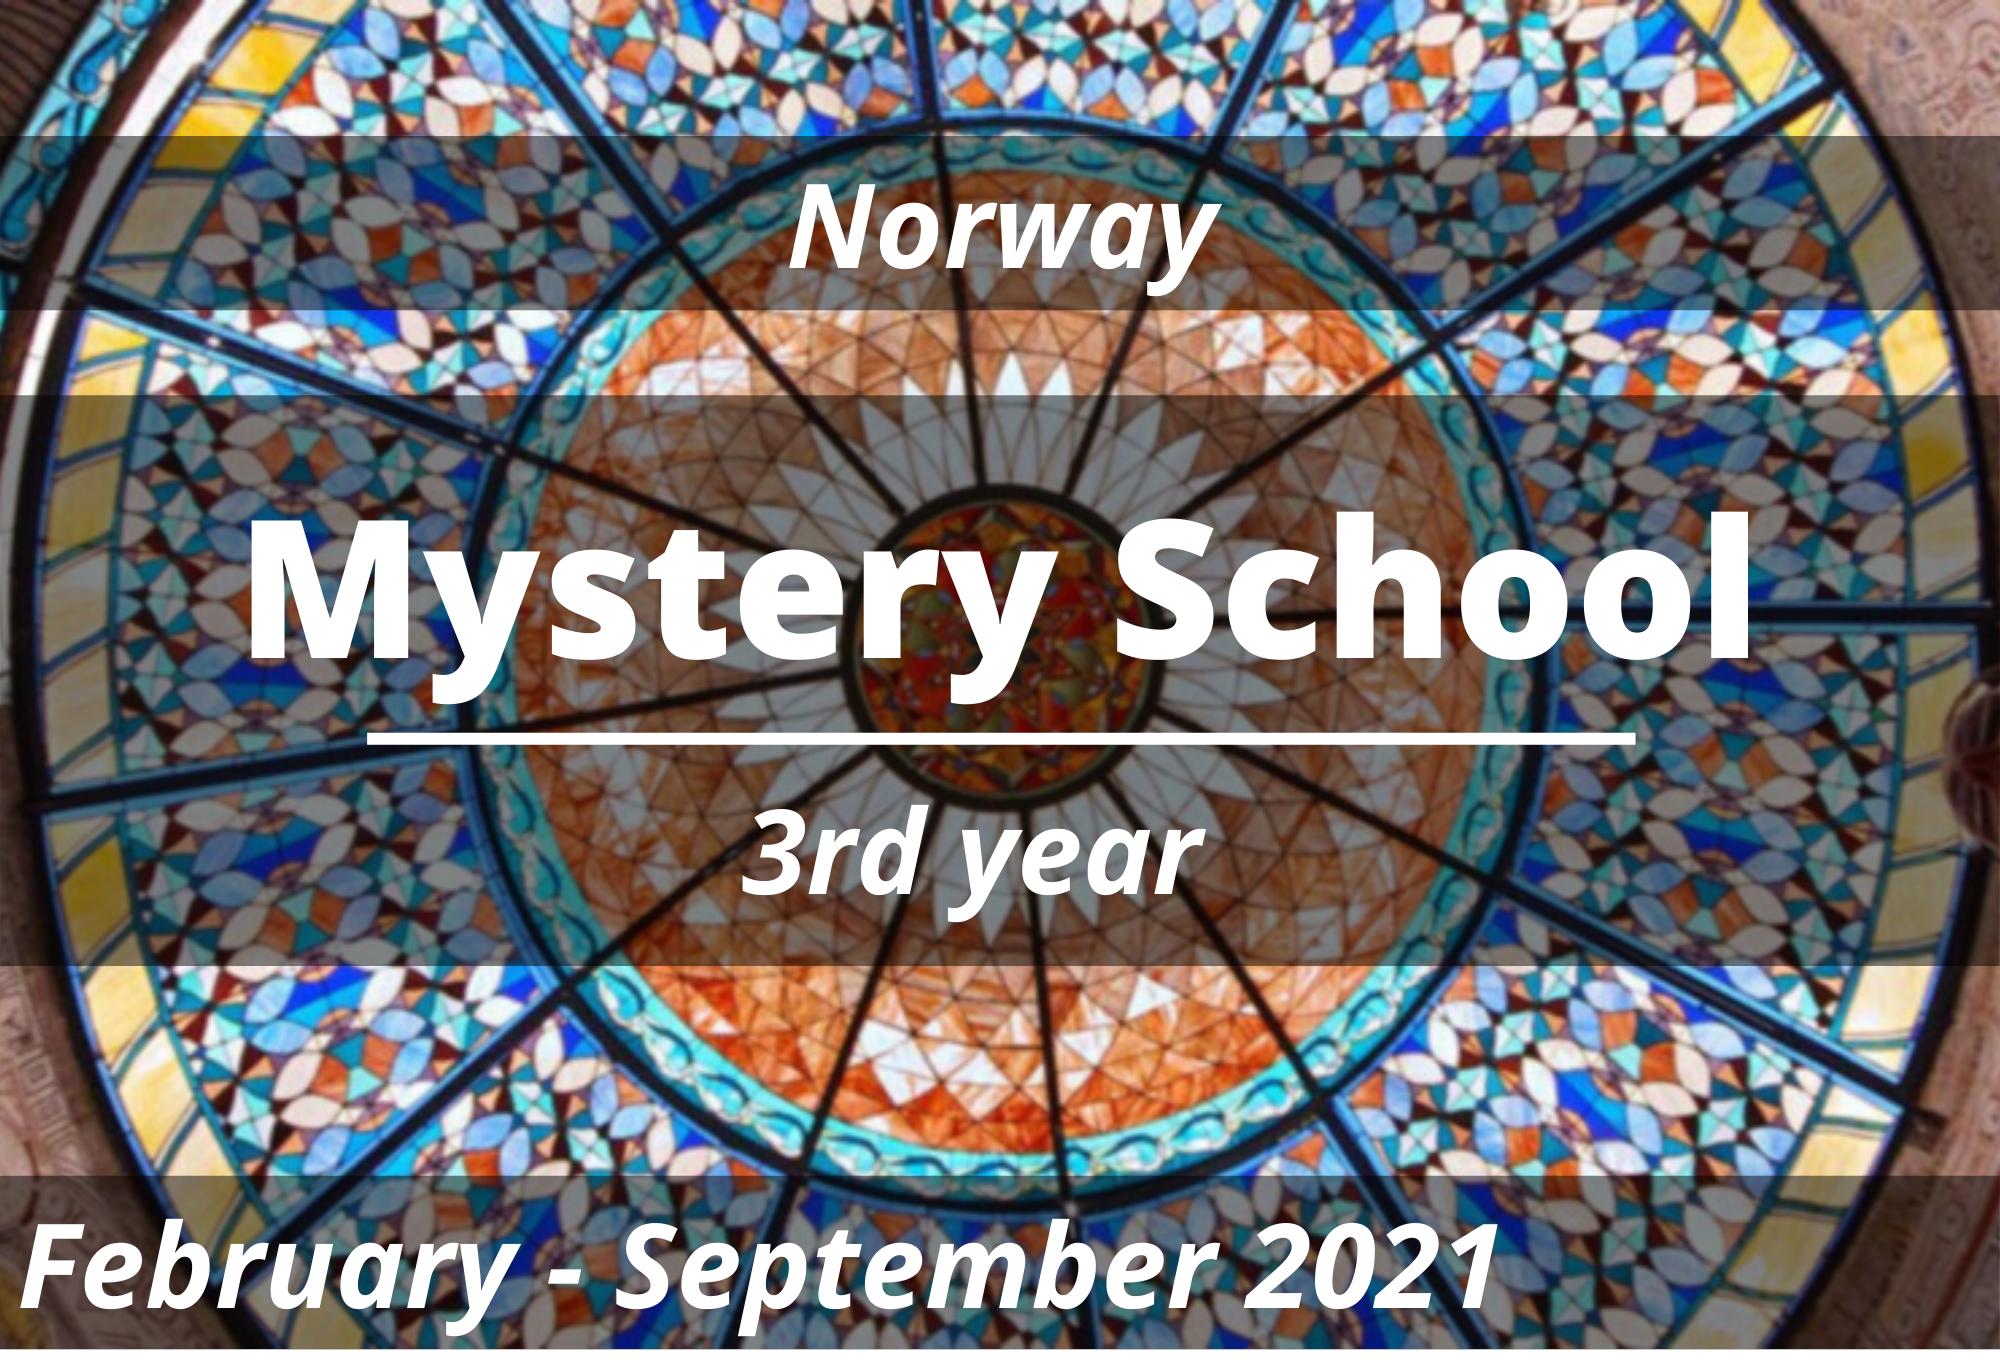 Mystery School Norway 2021, 3rd year